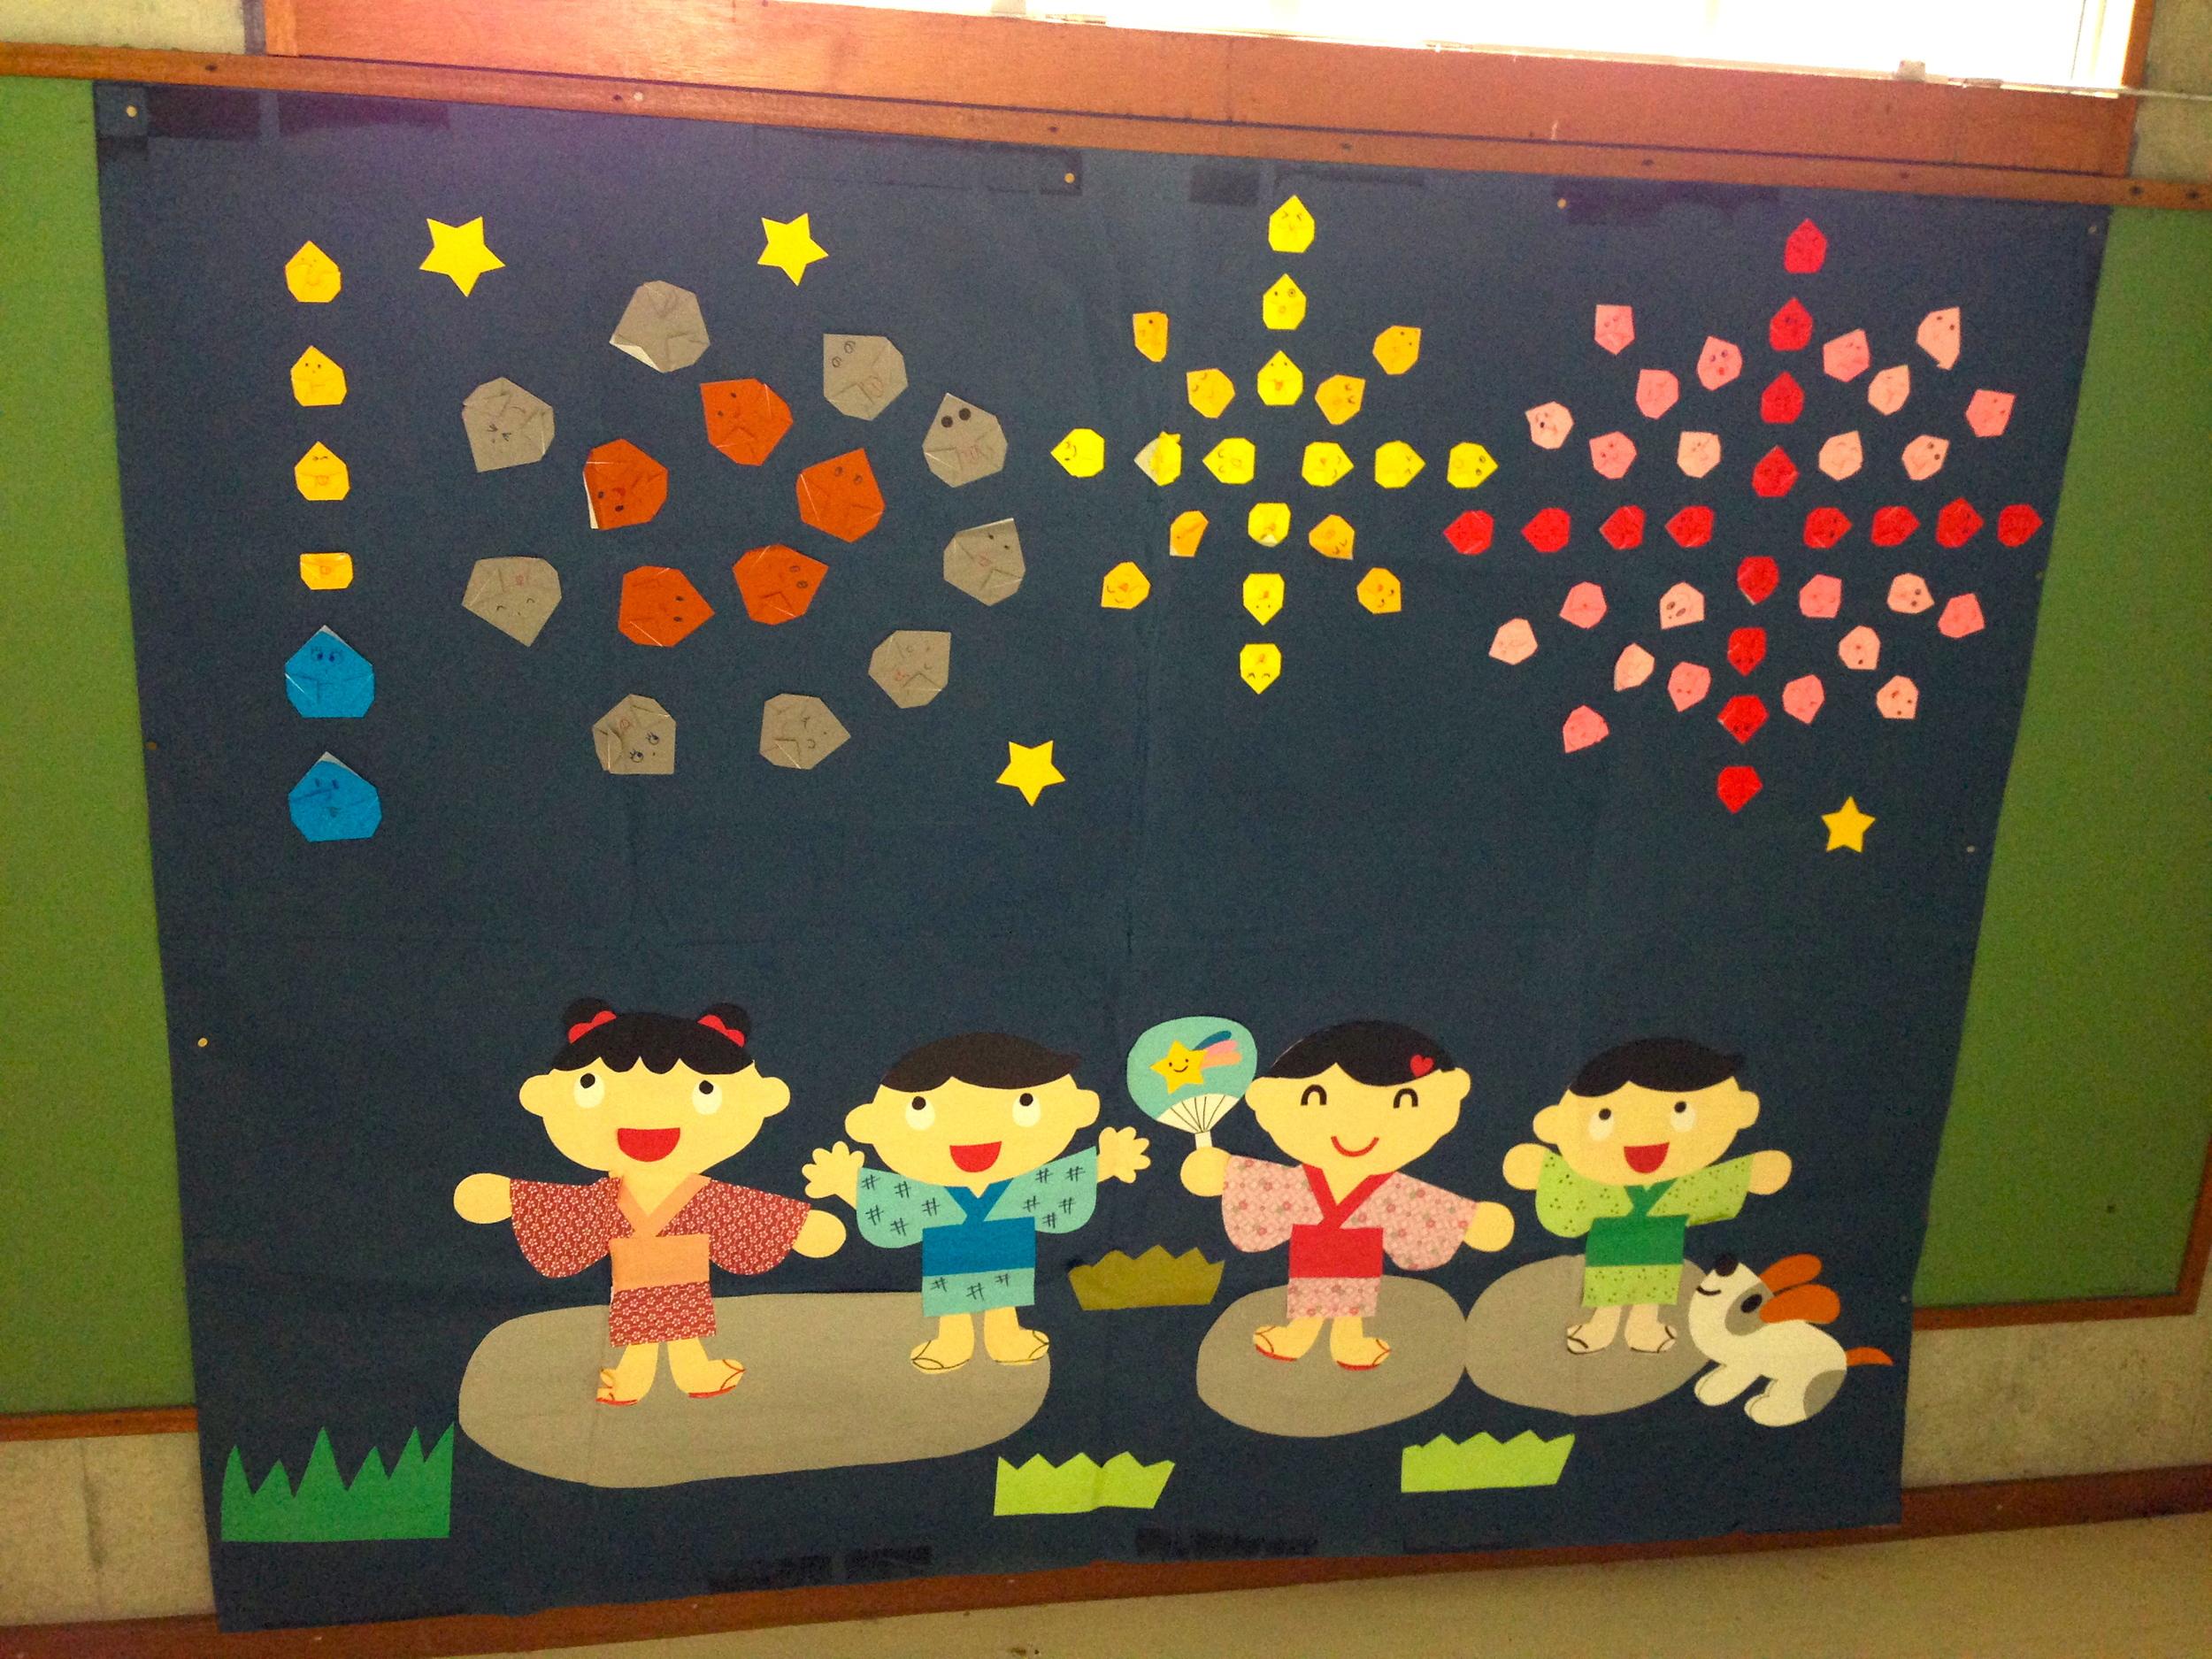 Elementary school student work